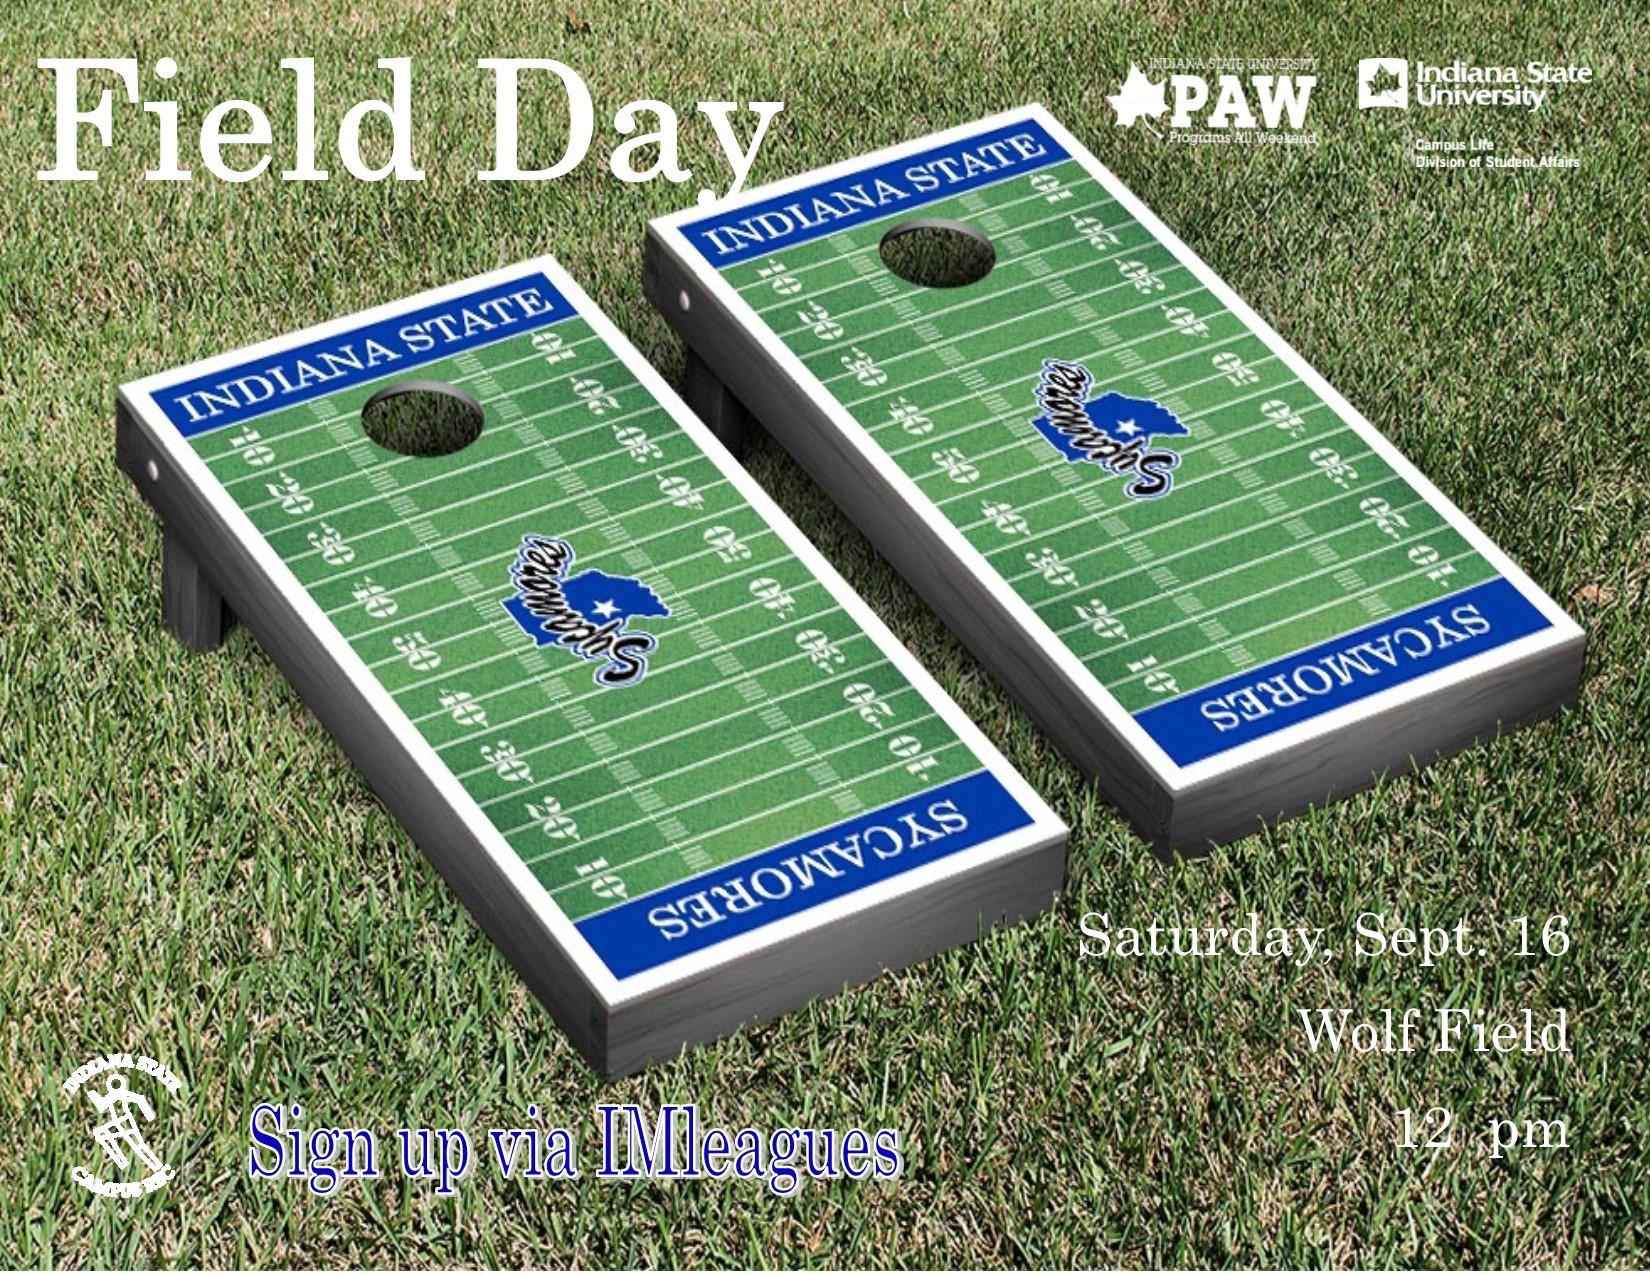 Field Day Program